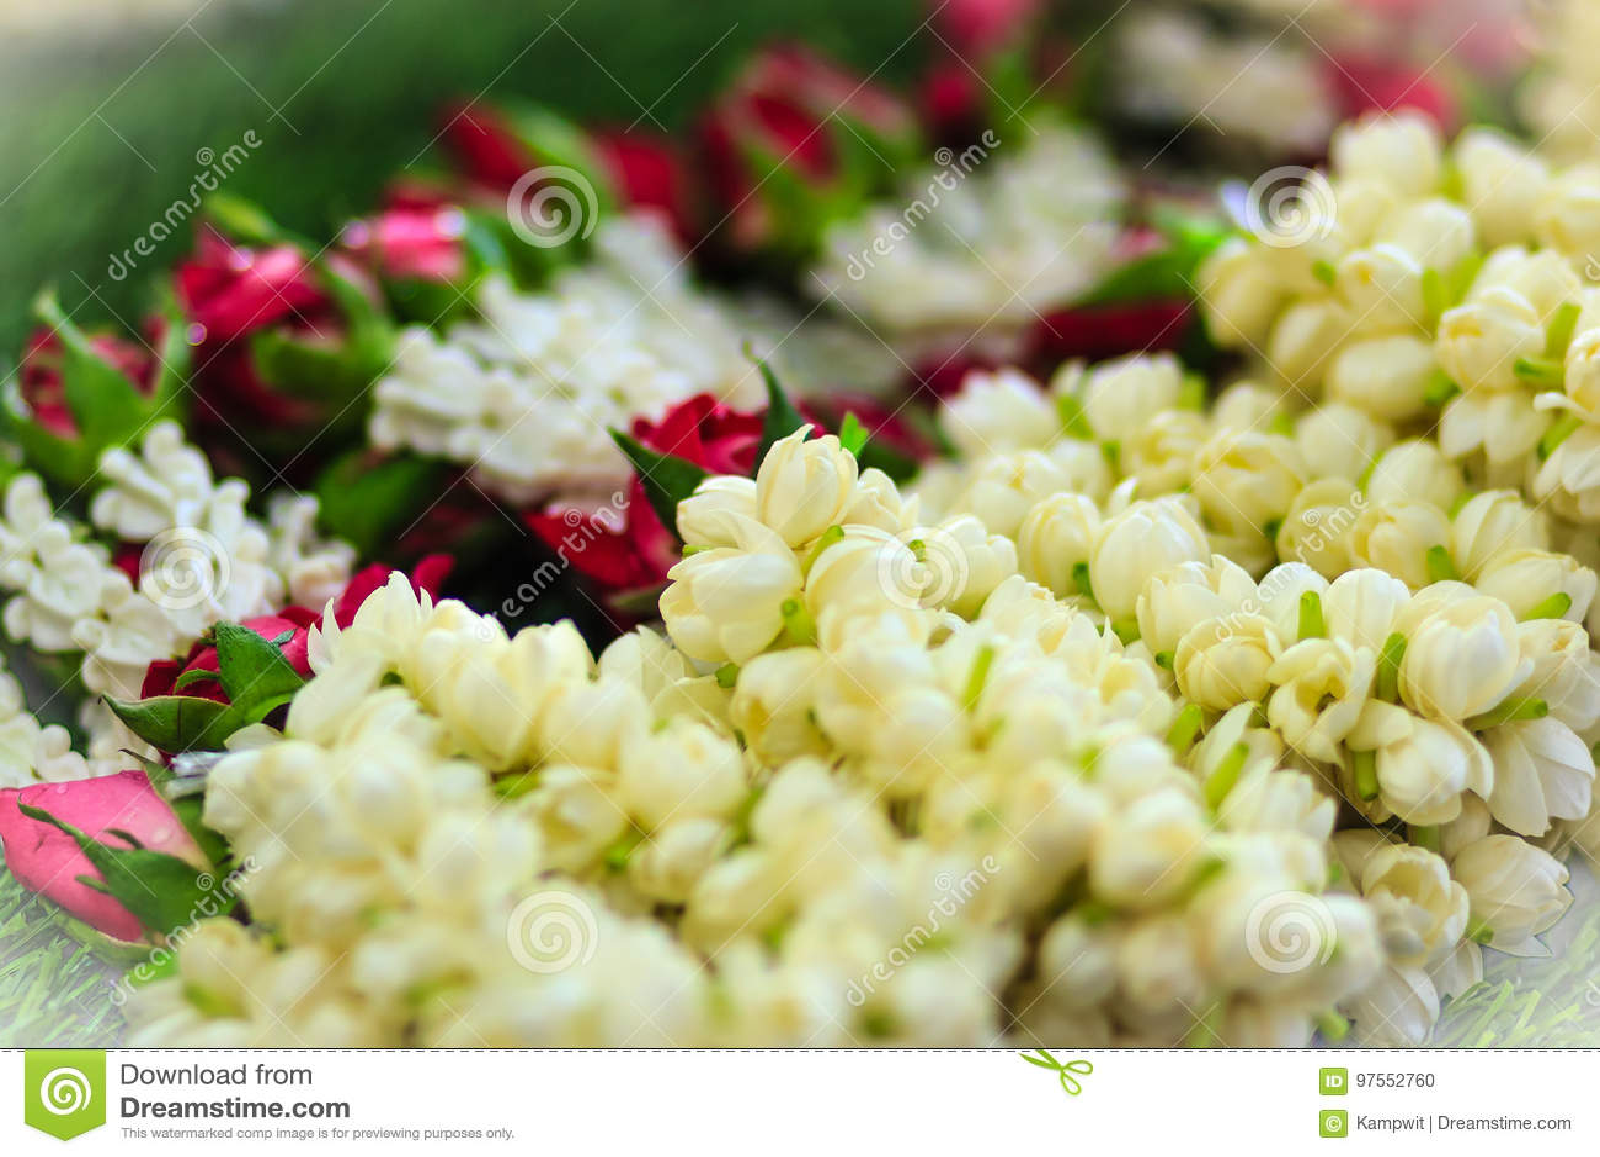 Beautiful garlands made of jasminesroses and crown flowers for beautiful garlands made of jasminesroses and crown flowers for izmirmasajfo